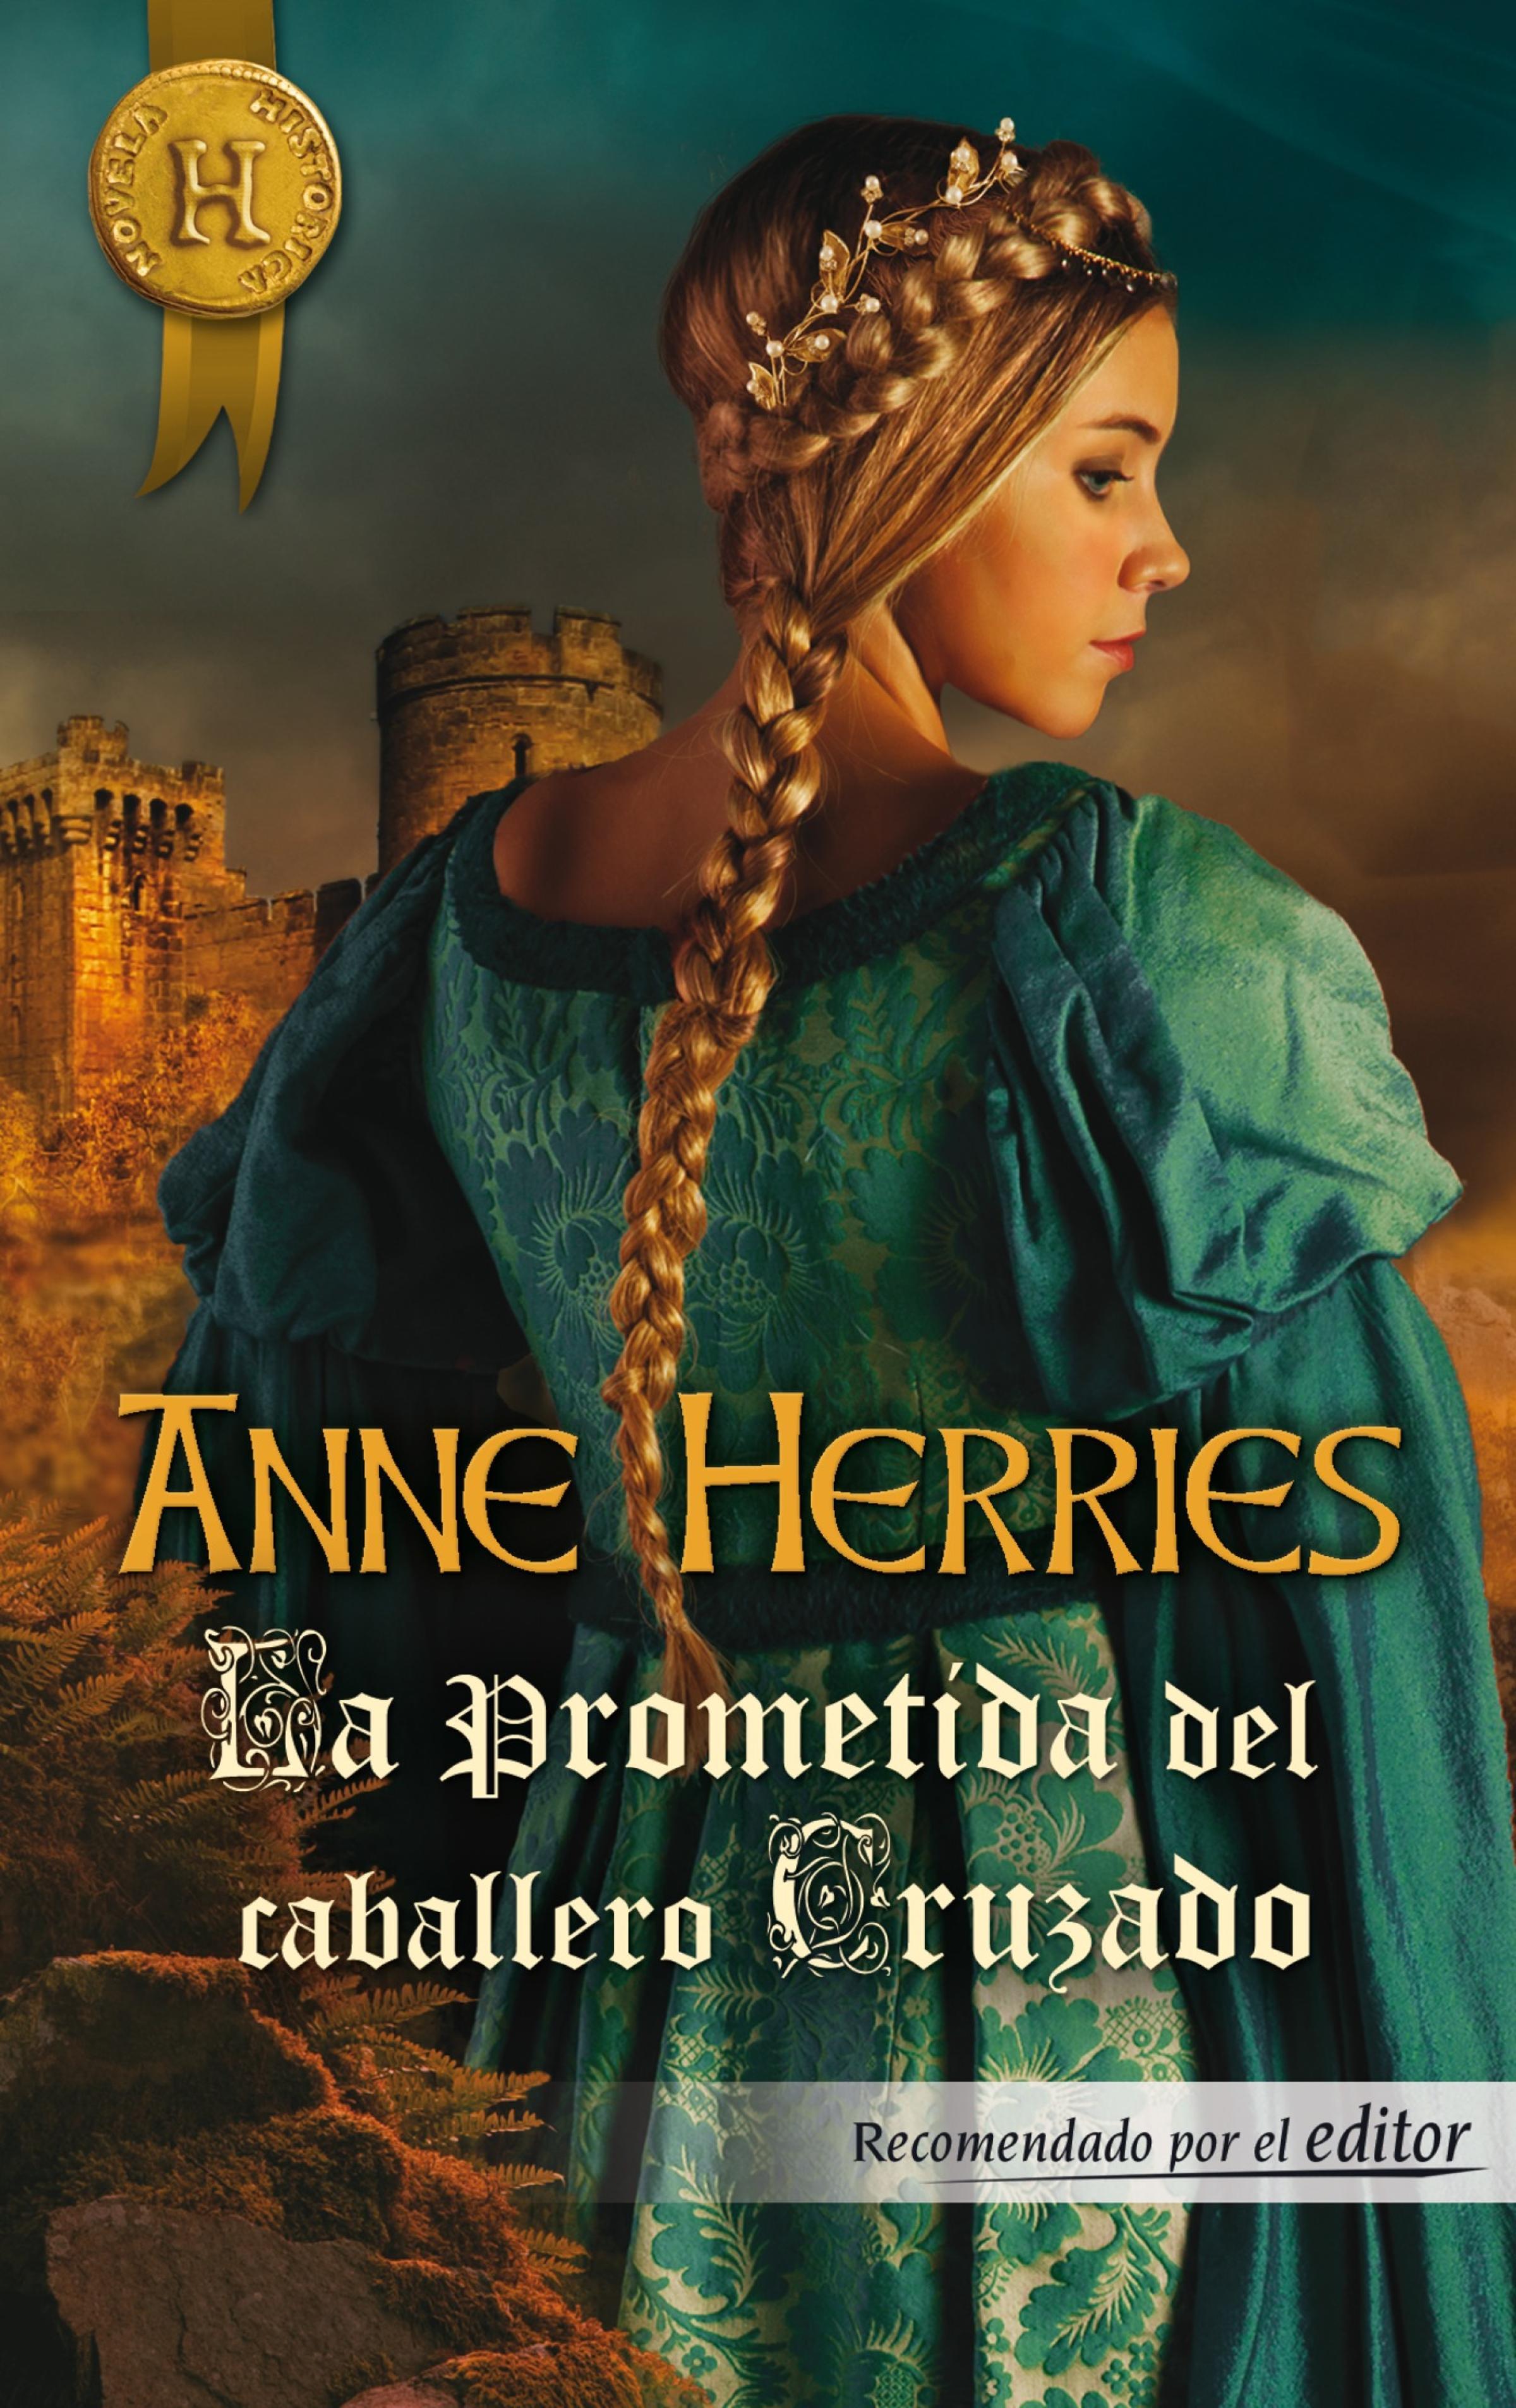 Anne Herries La prometida del caballero cruzado